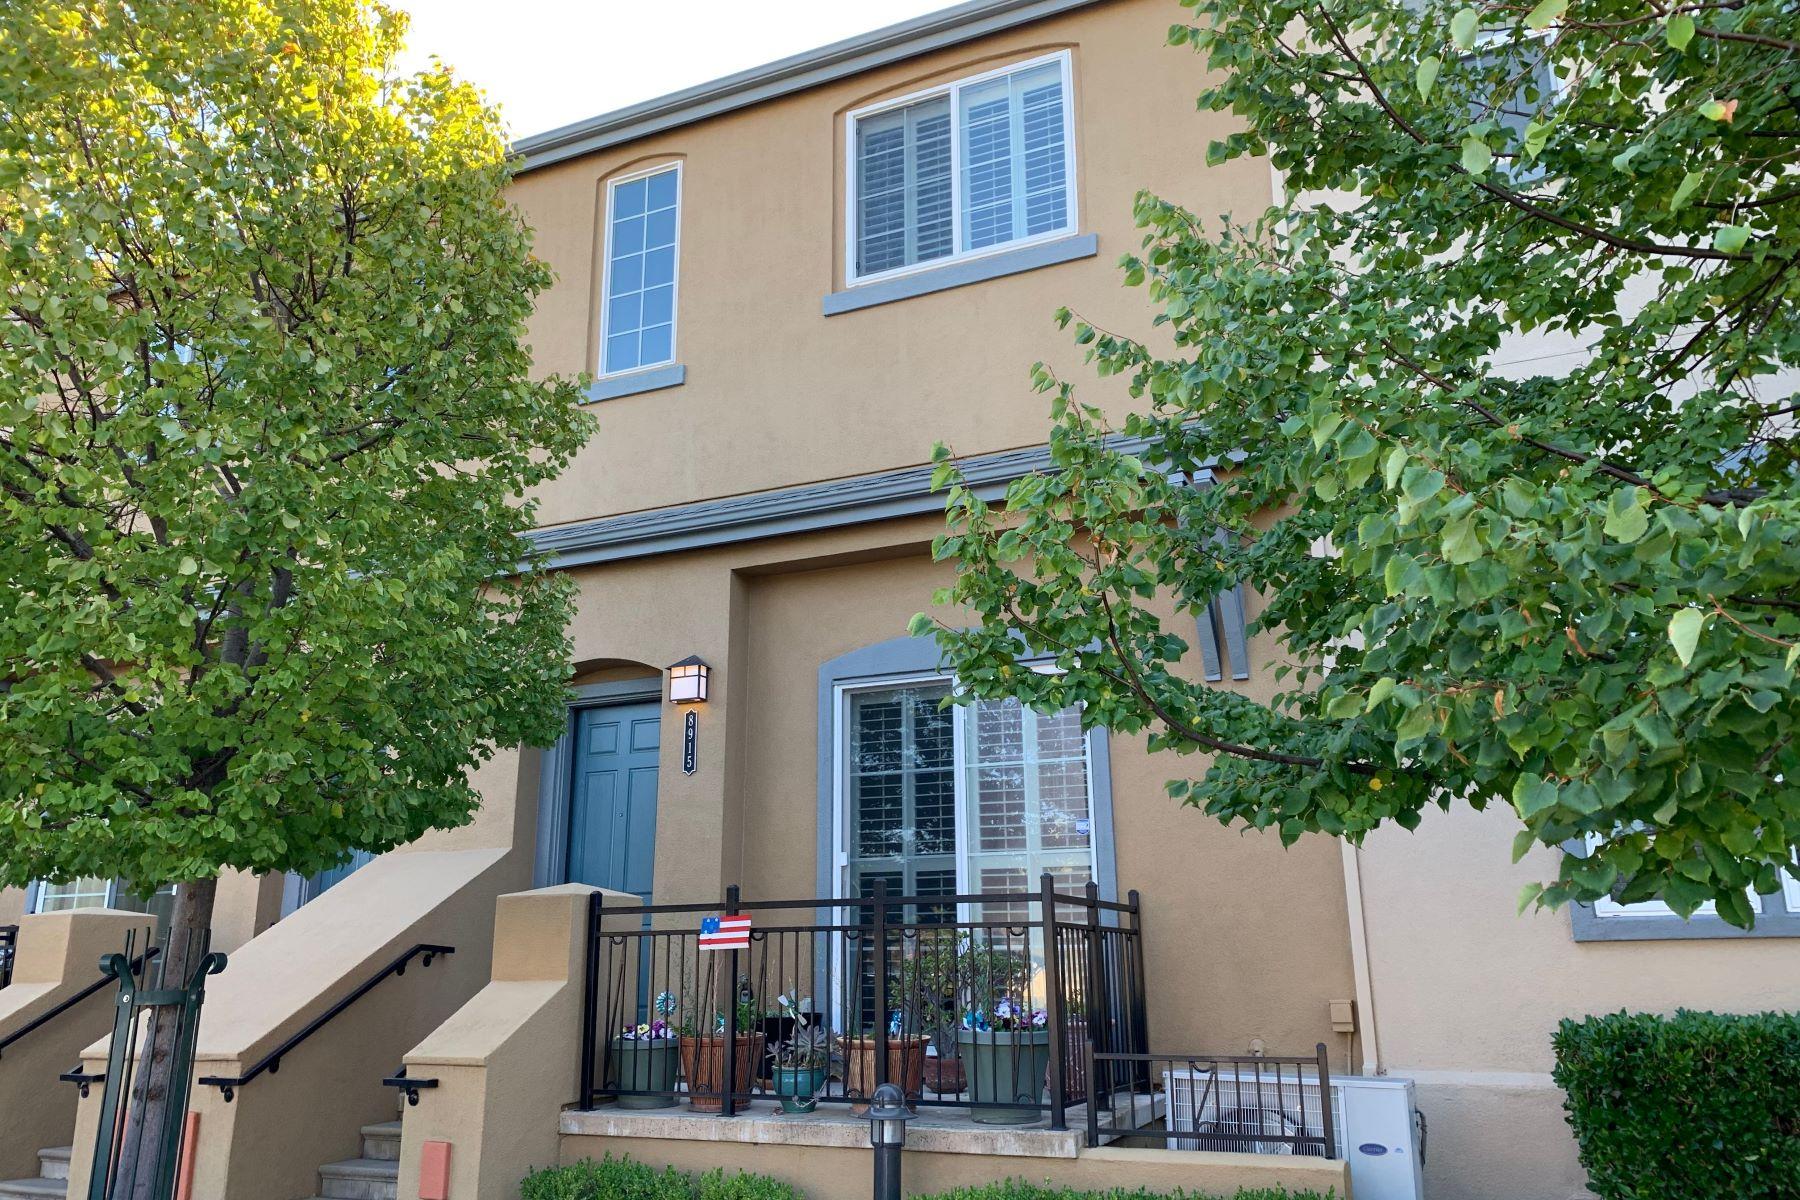 Condominiums for Sale at 8915 San Ramon Road, Dublin, CA 94568 8915 San Ramon Road Dublin, California 94568 United States